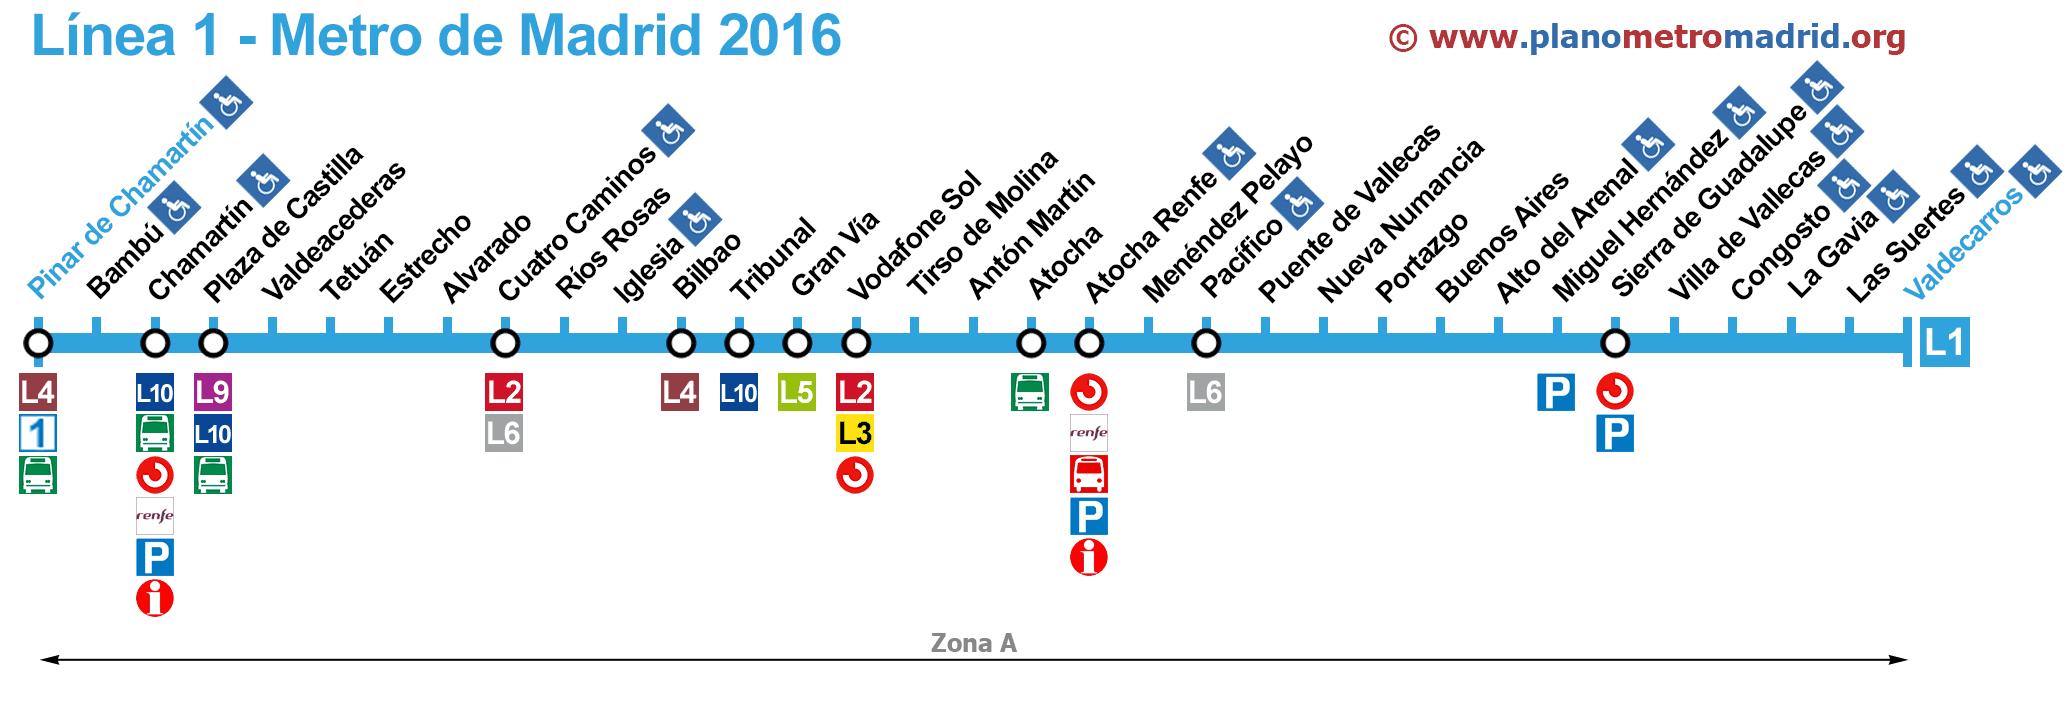 metro-madrid-linea-1